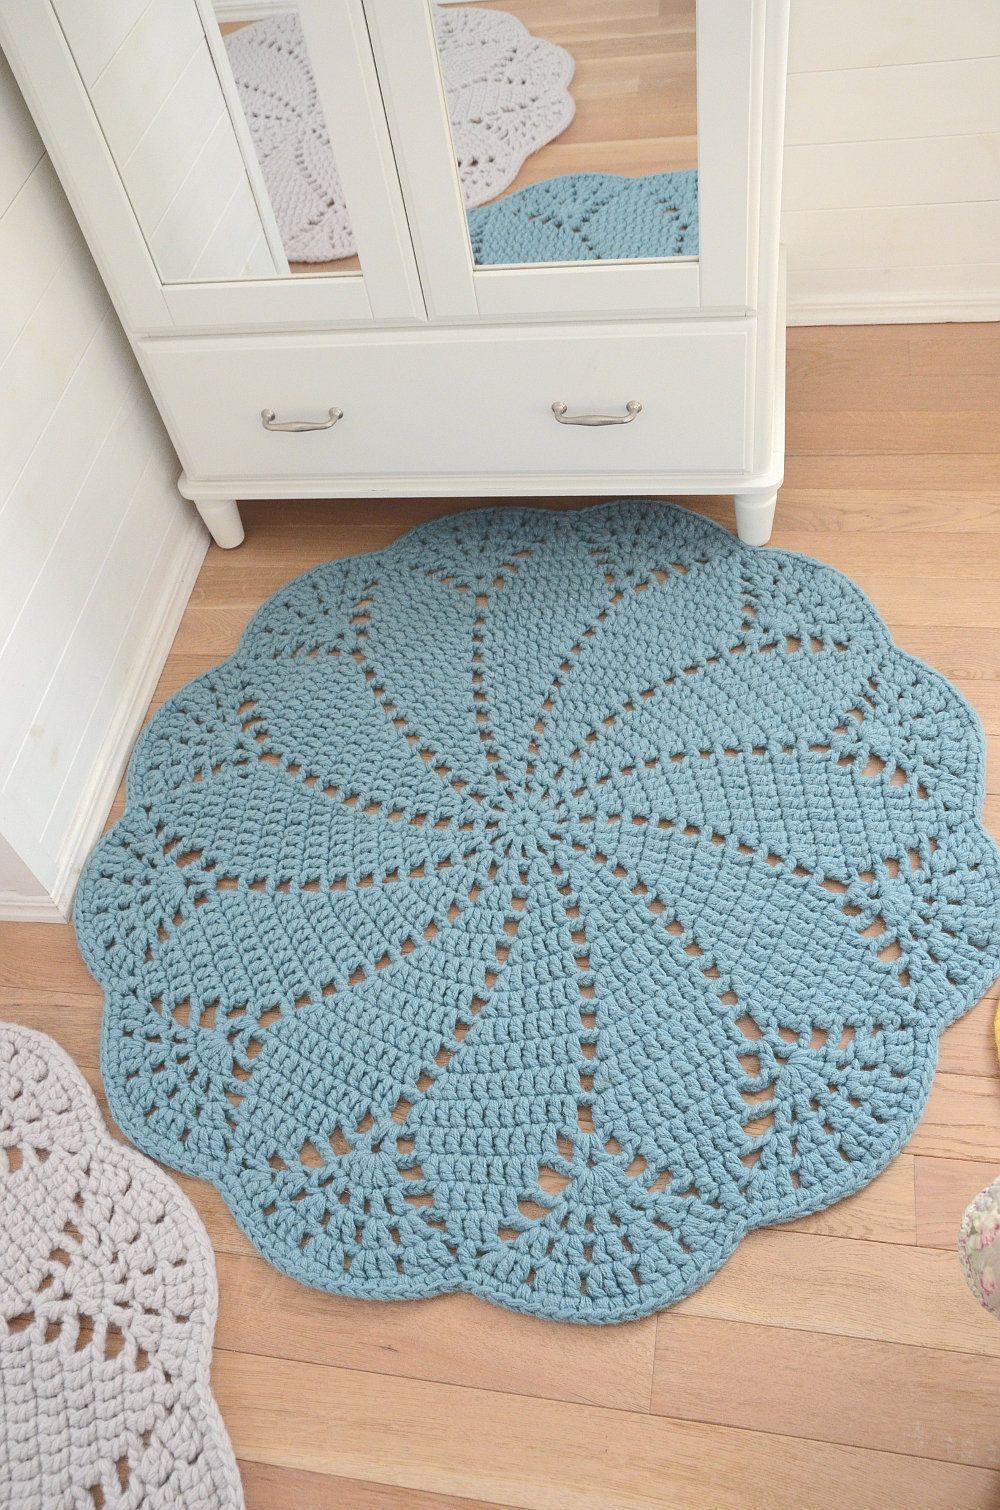 Light Blue Round Crochet Doily Rug Wool Felt Oversized Boho Etsy Crochet Doily Rug Doily Rug Crochet Rug Patterns